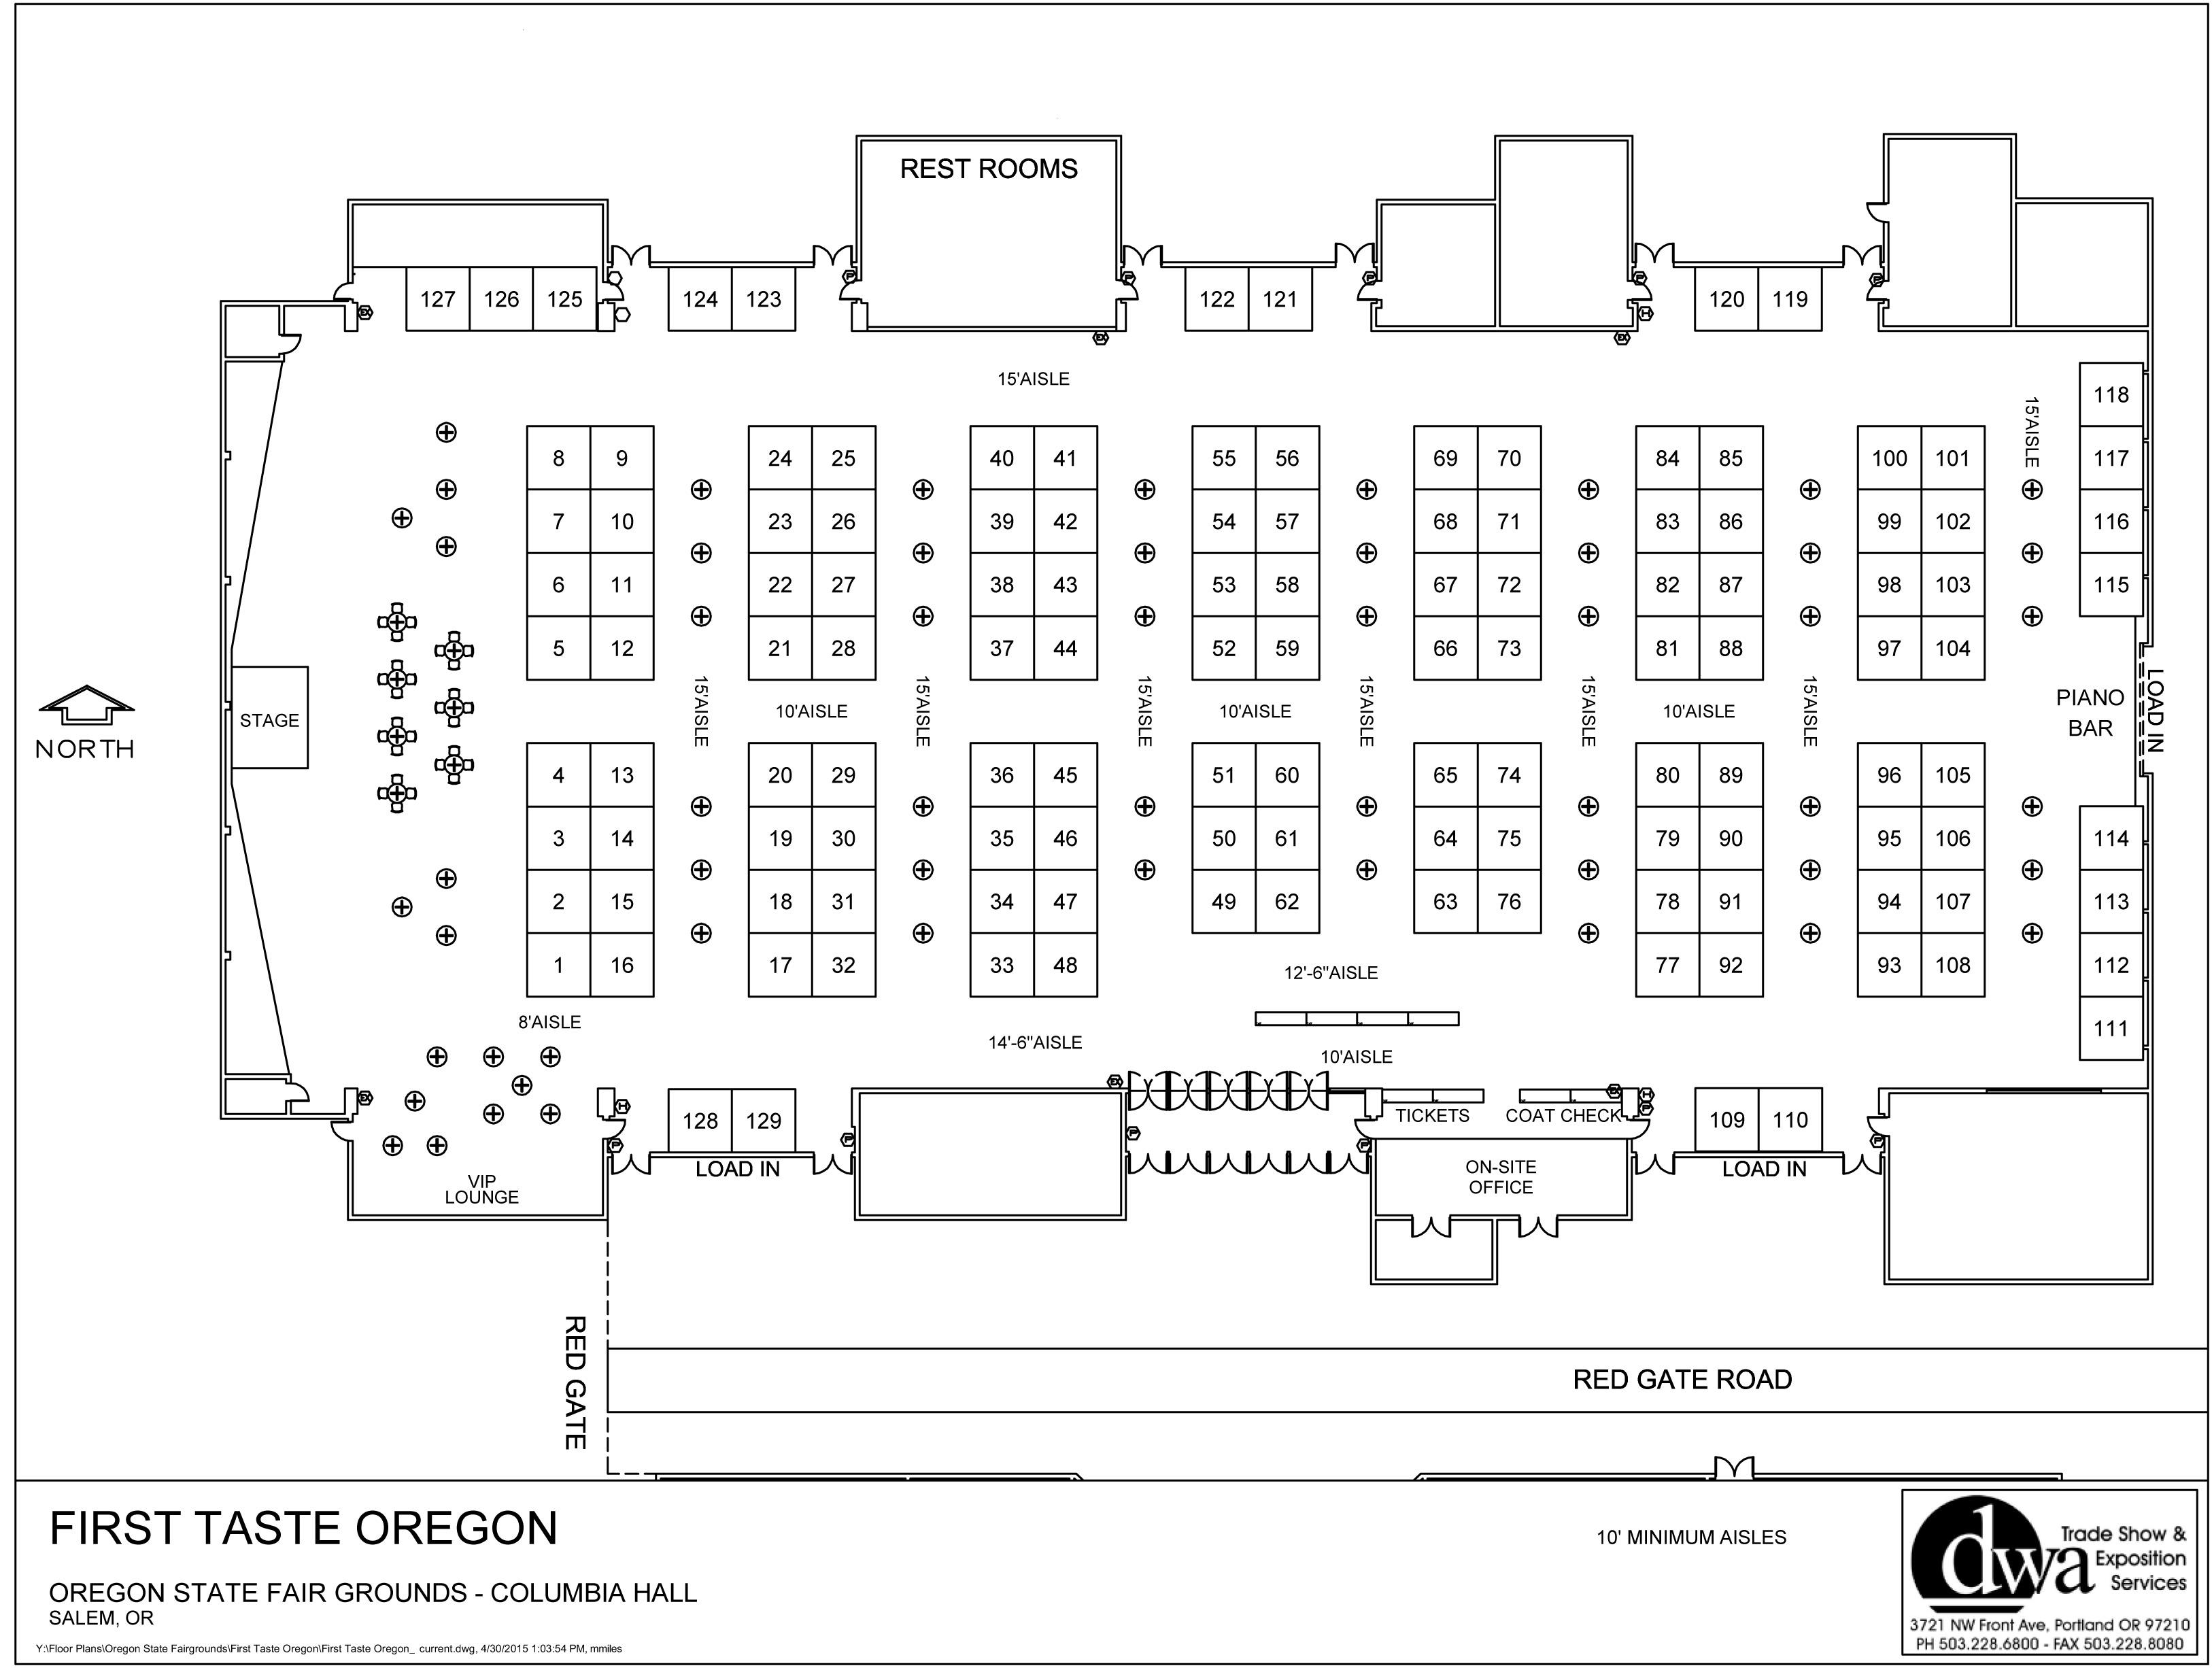 Y:Floor PlansOregon State FairgroundsFirst Taste OregonFirst